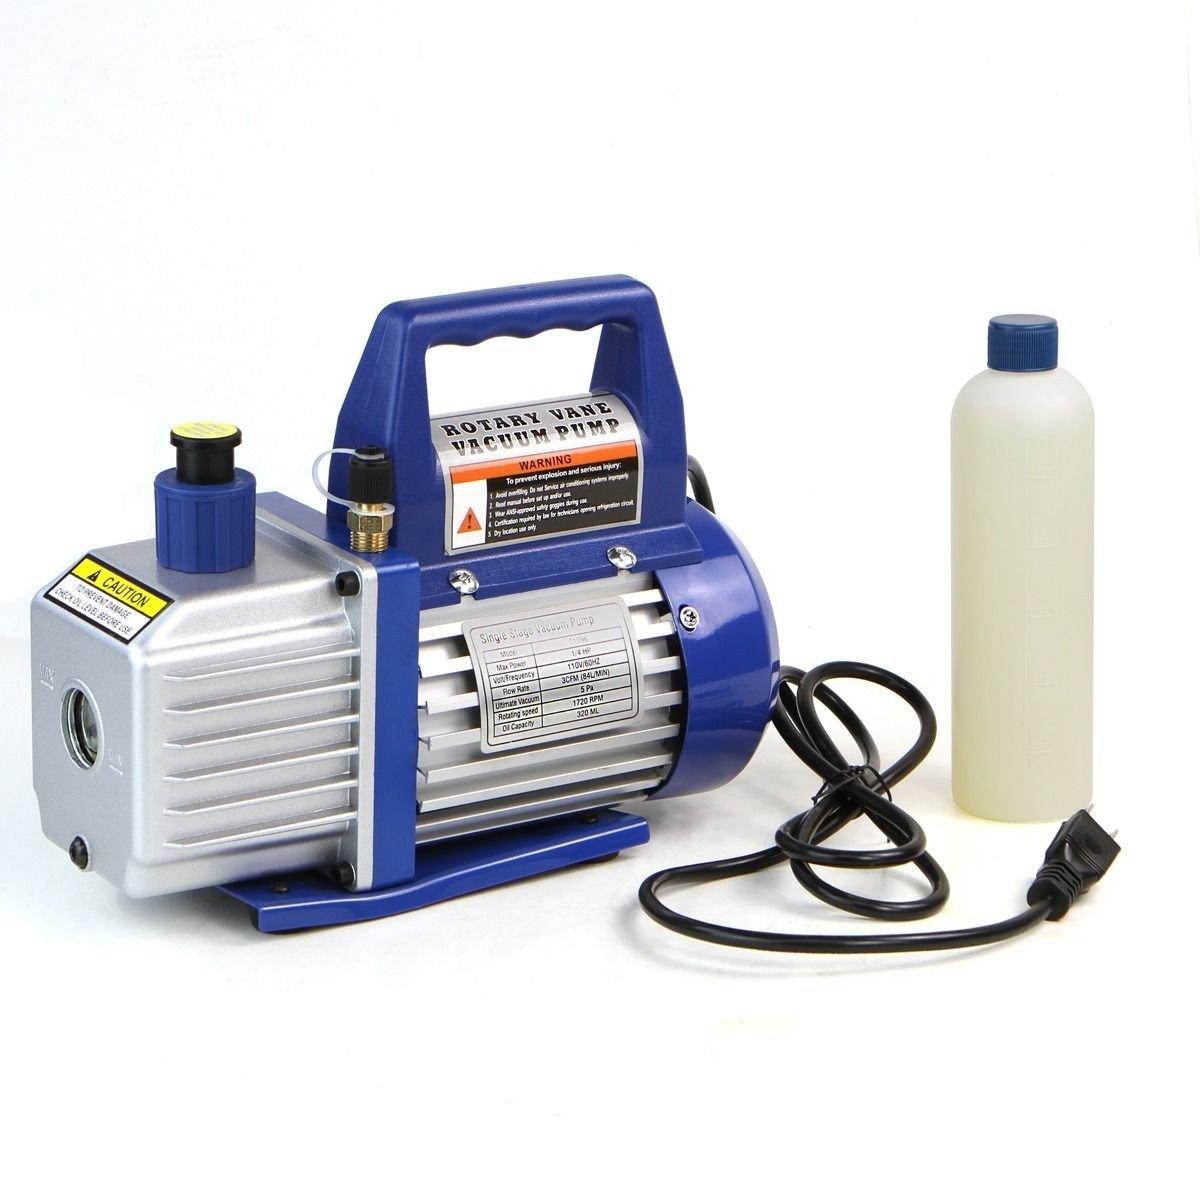 Goplus Vacuum Pump 1//3HP Rotary Vane Deep Refrigerant R410a R134a HVAC AC Air Tool with 1//4 Flare Inlet Port Single Stage 4CFM